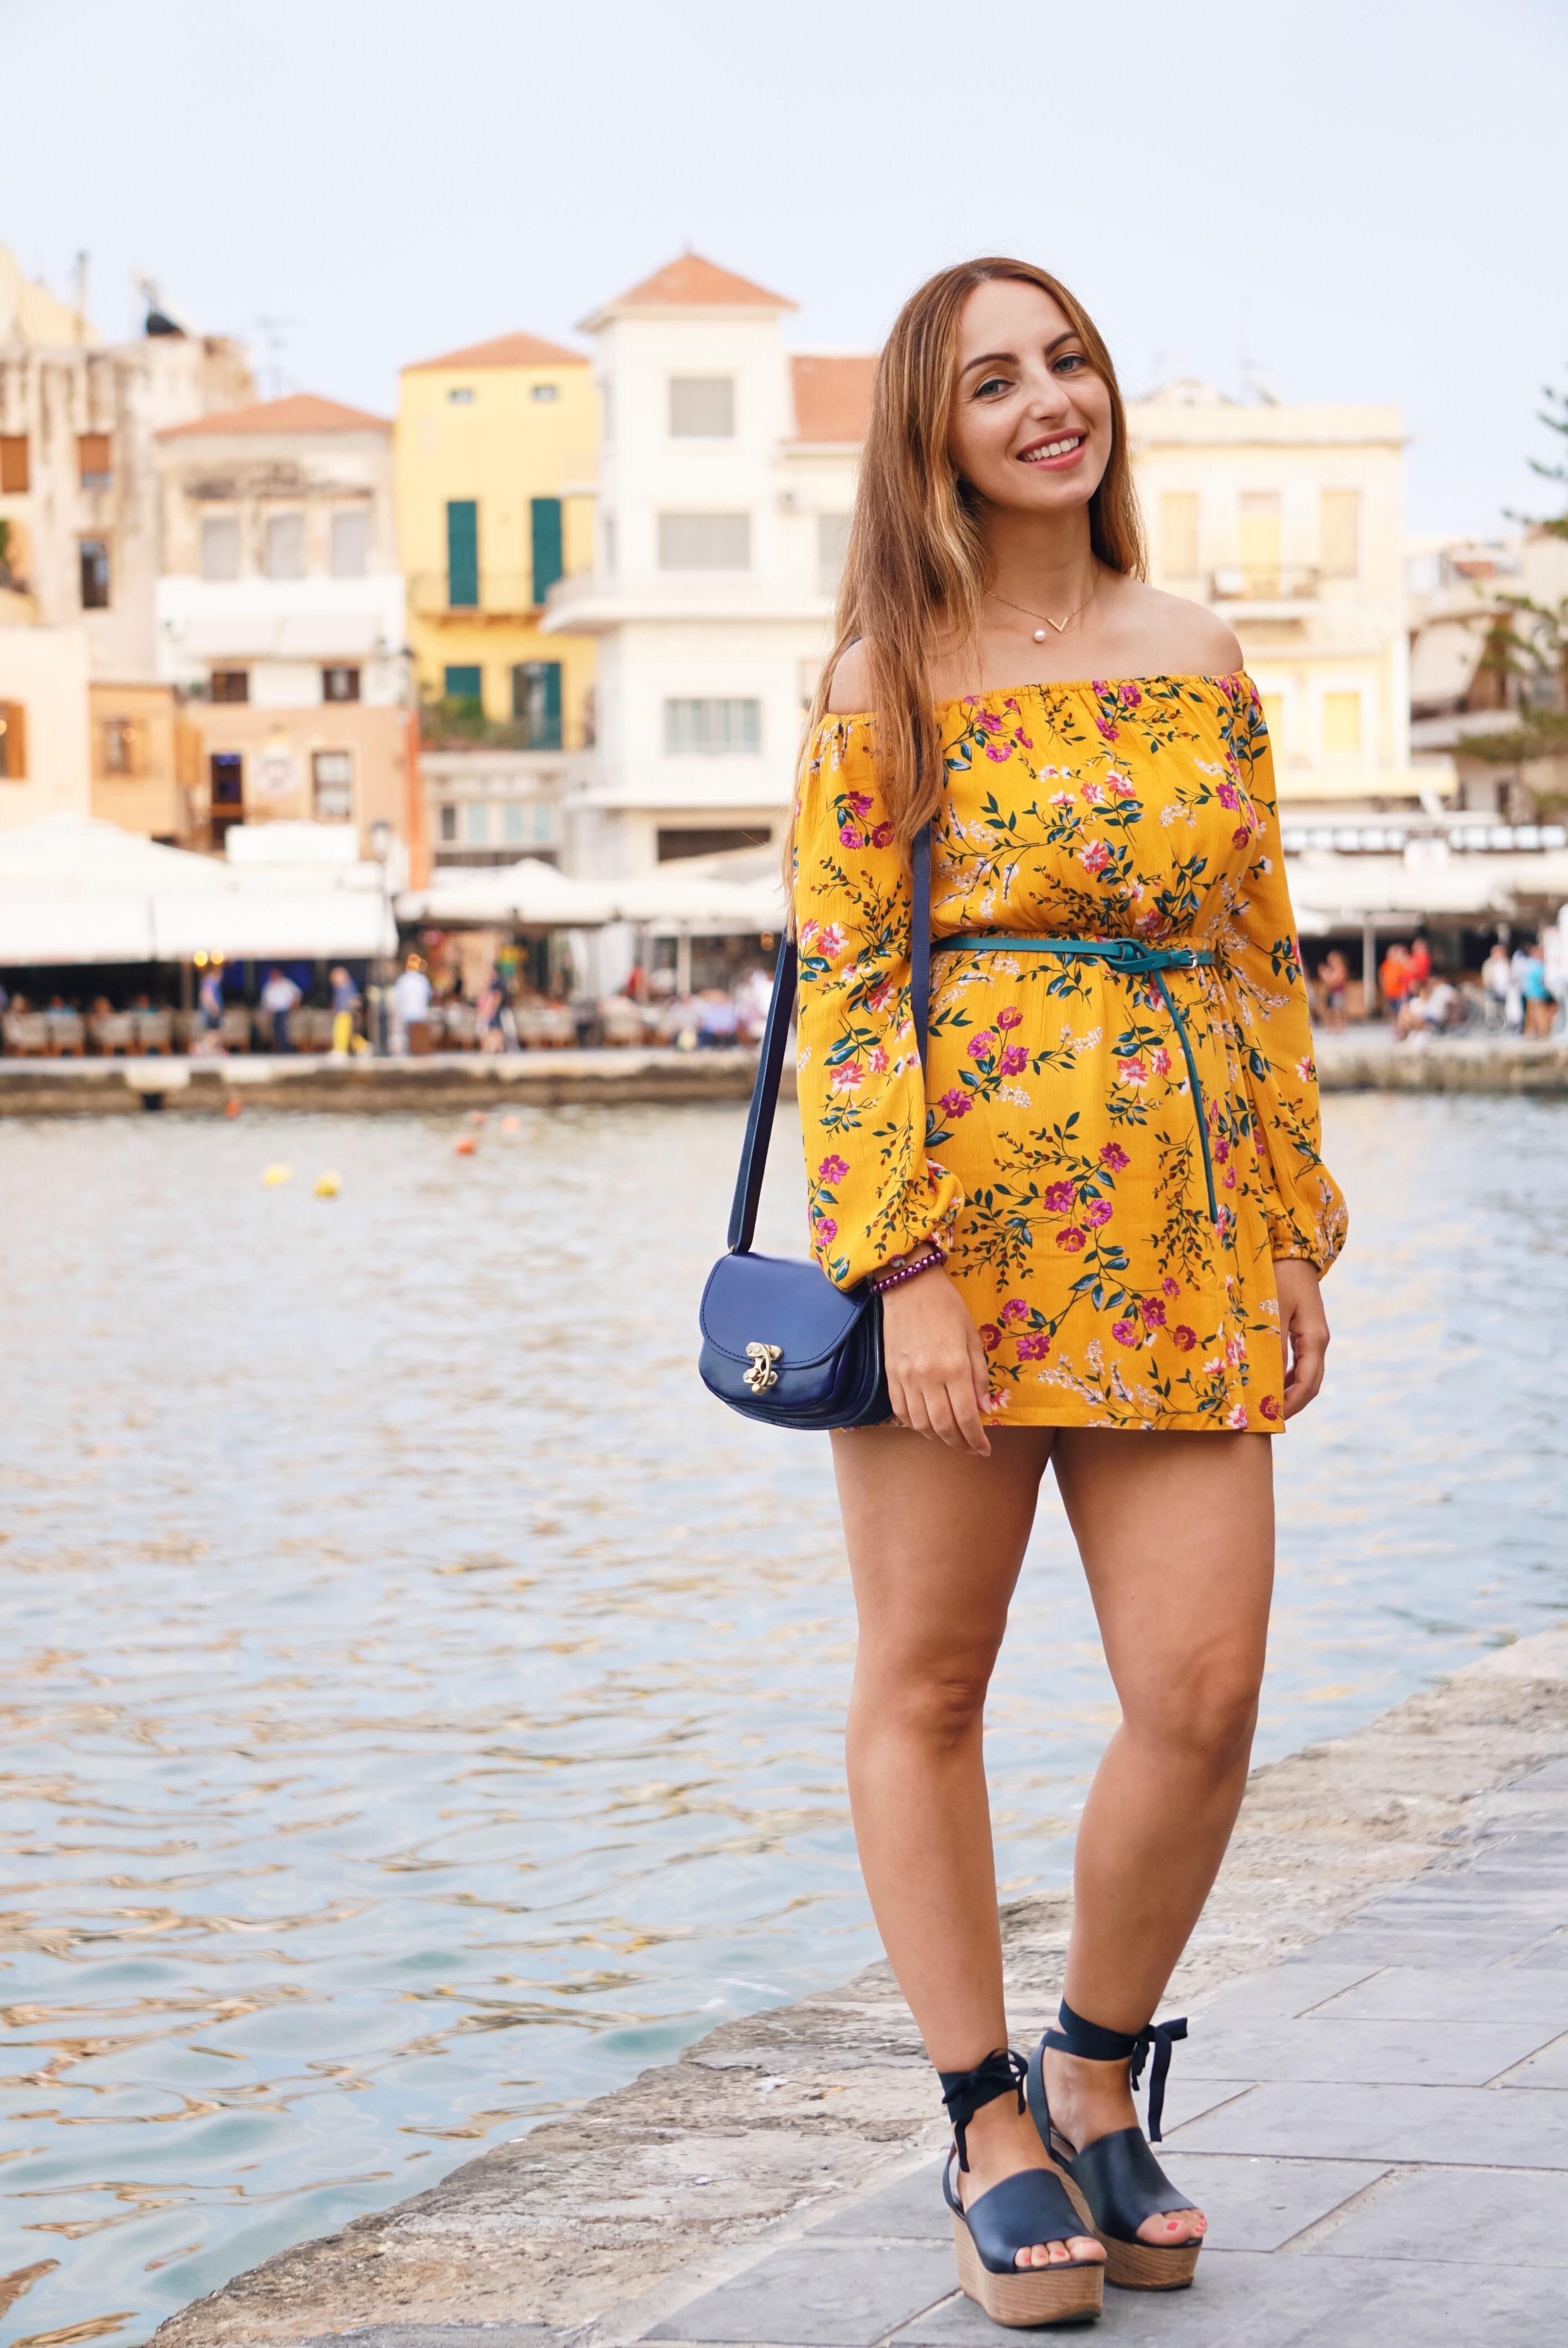 Chania-Crete-Fashionblogger-Outfit-Post-6